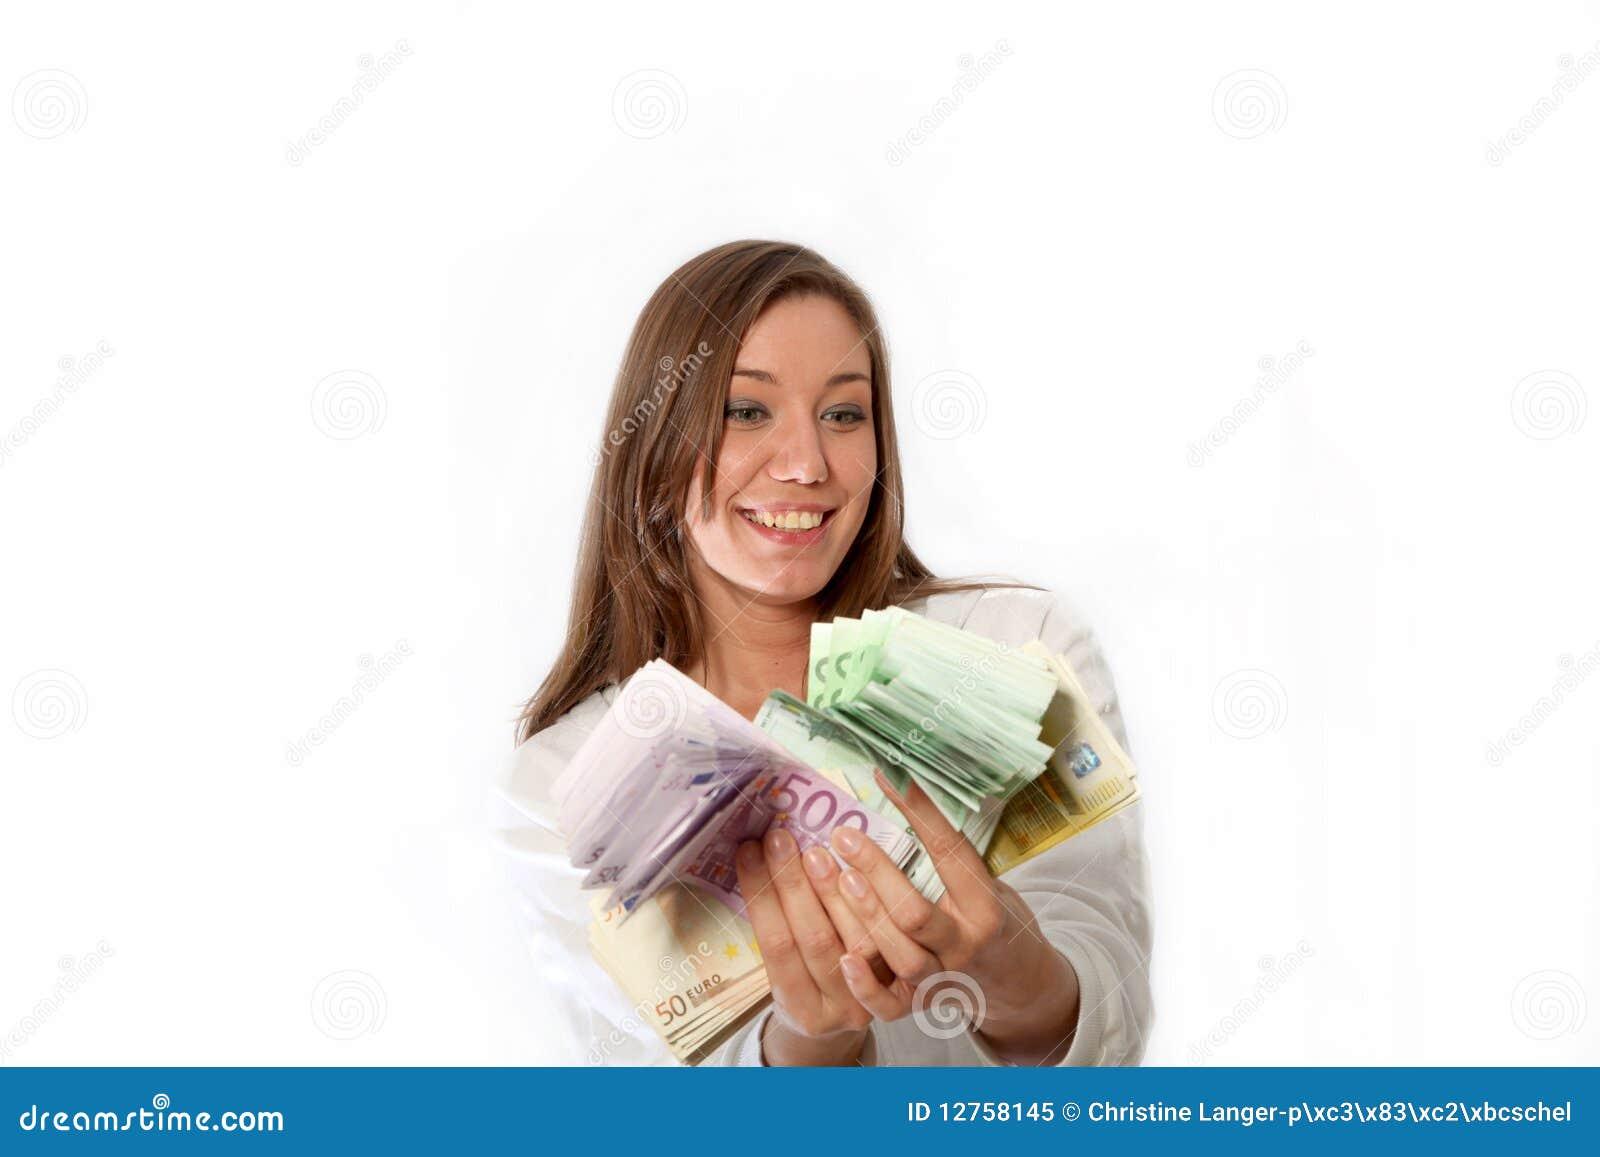 dinero women Lyrics to 'dinero' by jennifer lopez: khaled] yo quiero, yo quiero dinero,.